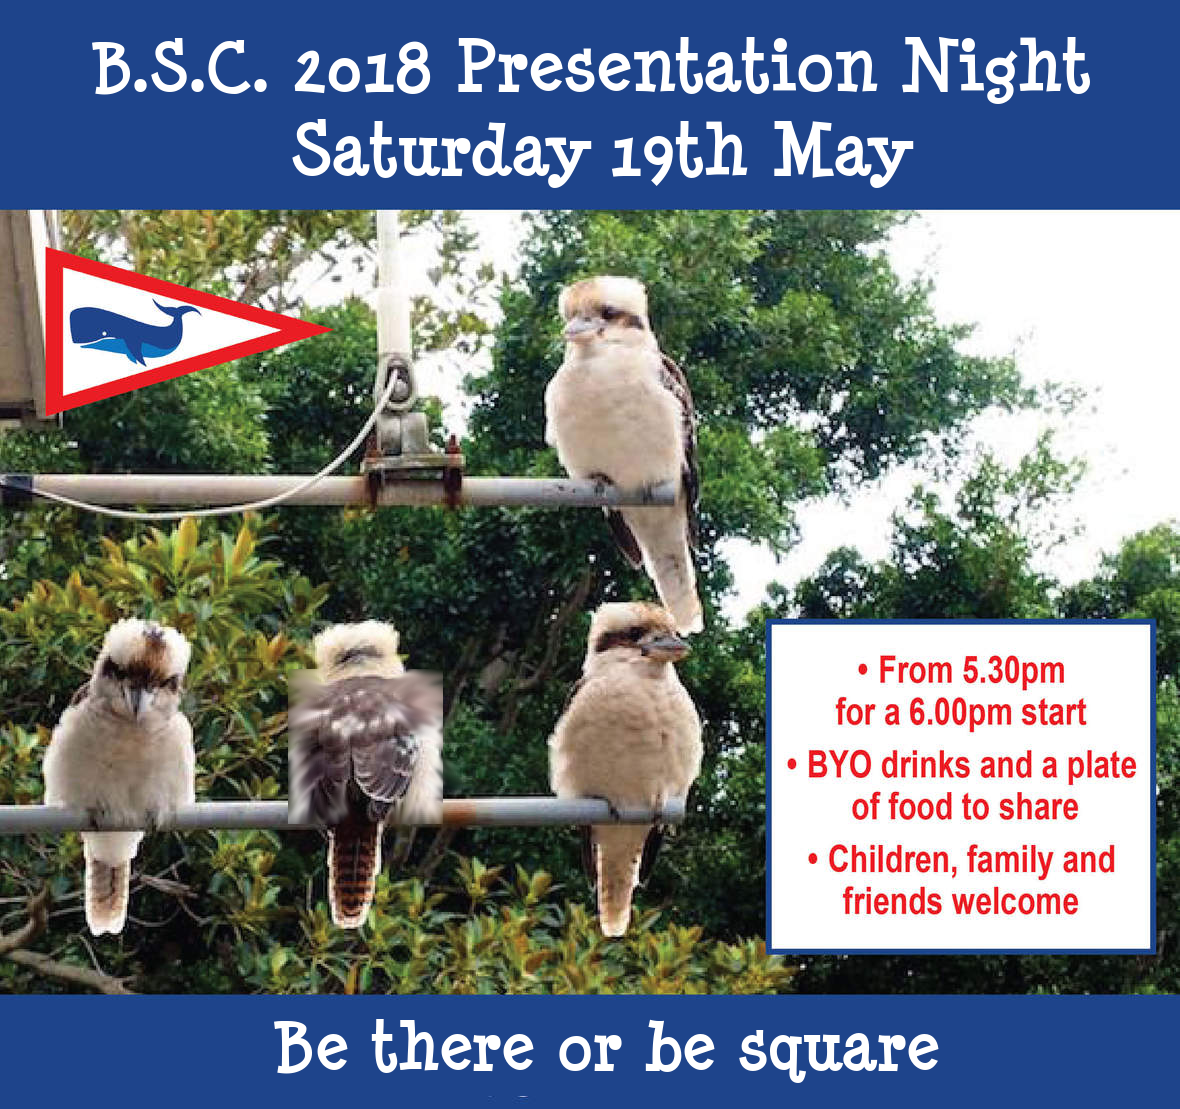 BSC Presso Night 2018